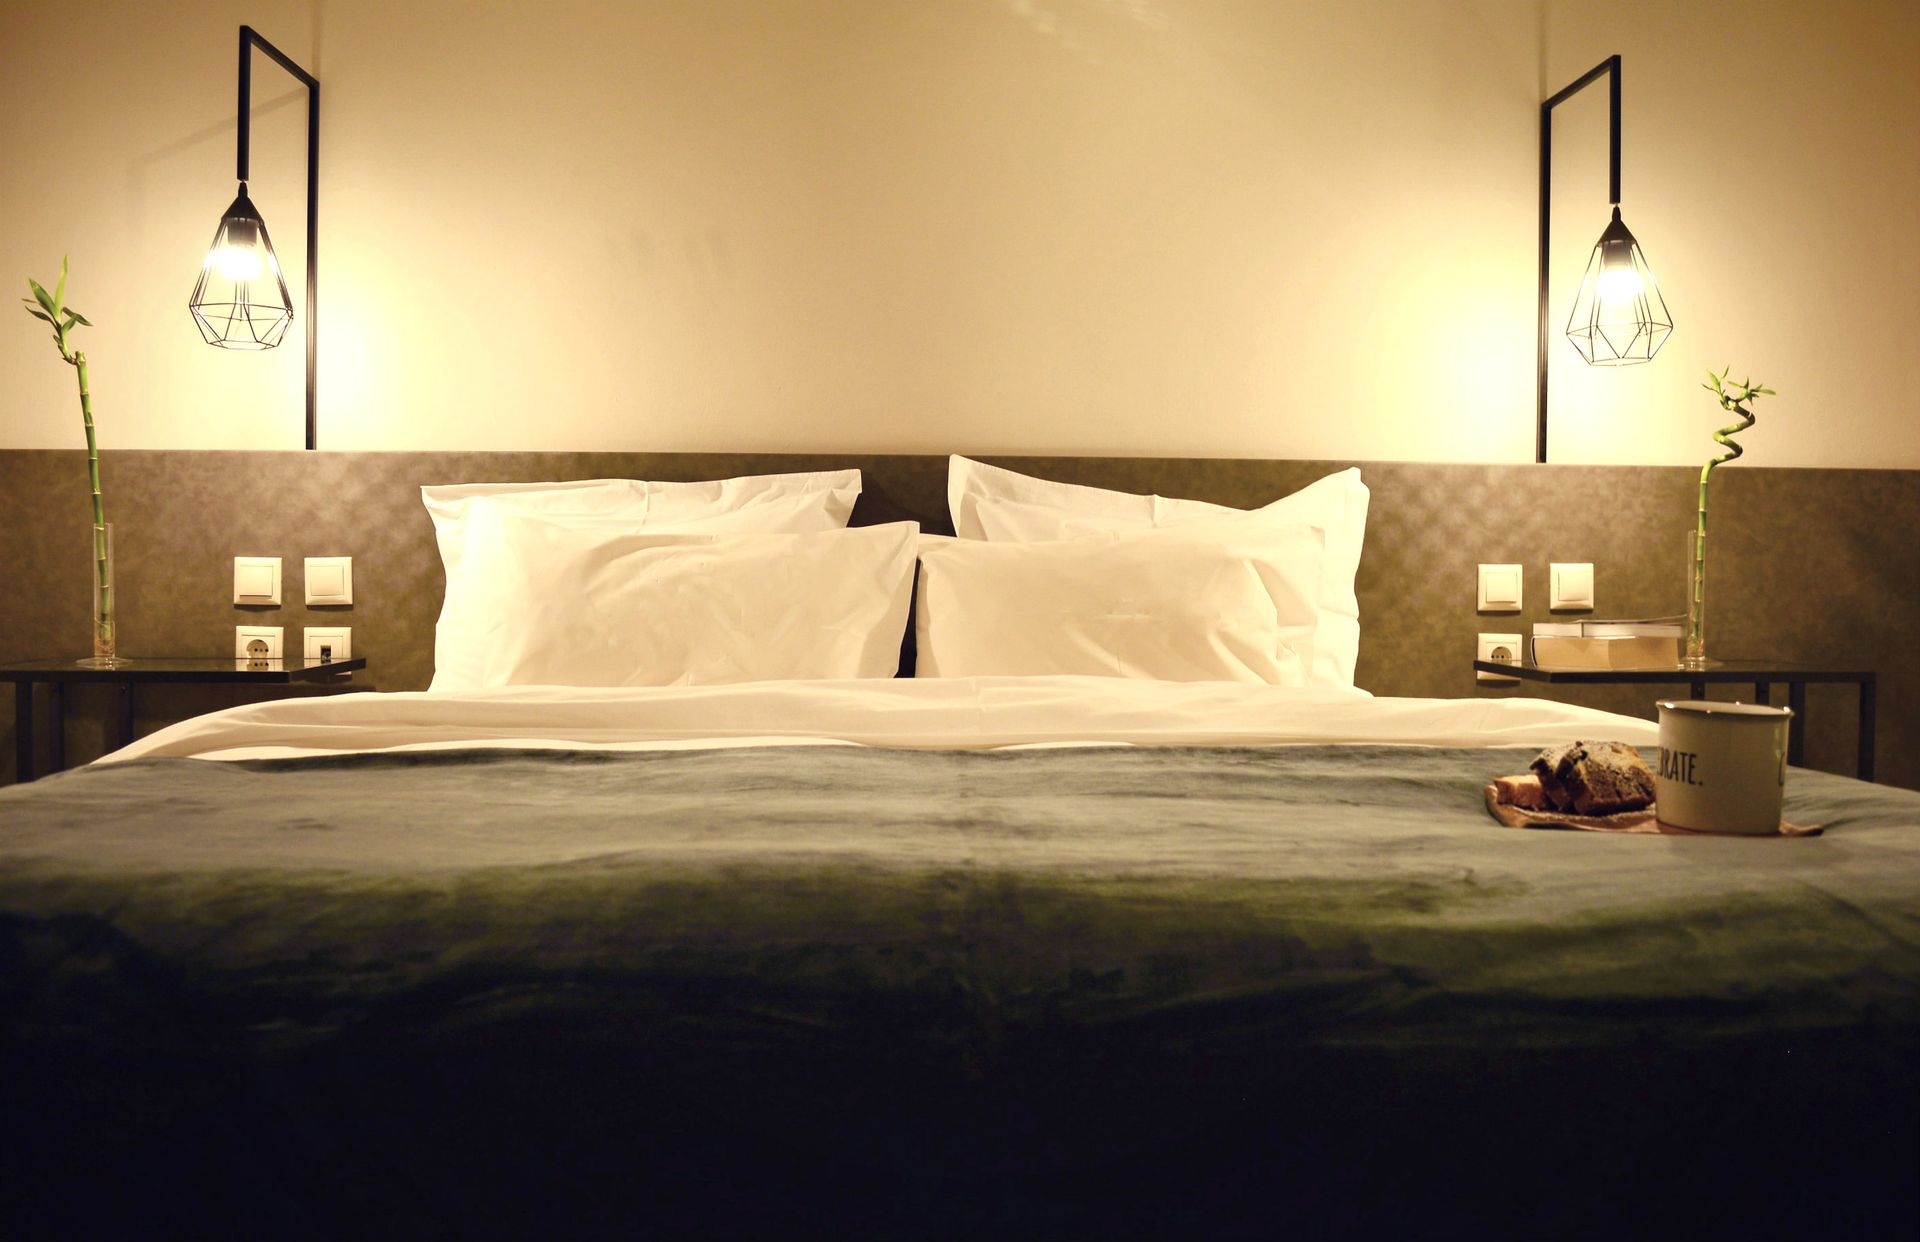 Alexakis Hotel - Λουτρα Υπατης ✦ 2 Ημερες (1 Διανυκτερευση) ✦ 2 ατομα ✦ Χωρις Πρωινο ✦ 31/01/2020 εως 30/04/2020 ✦ Free WiFi